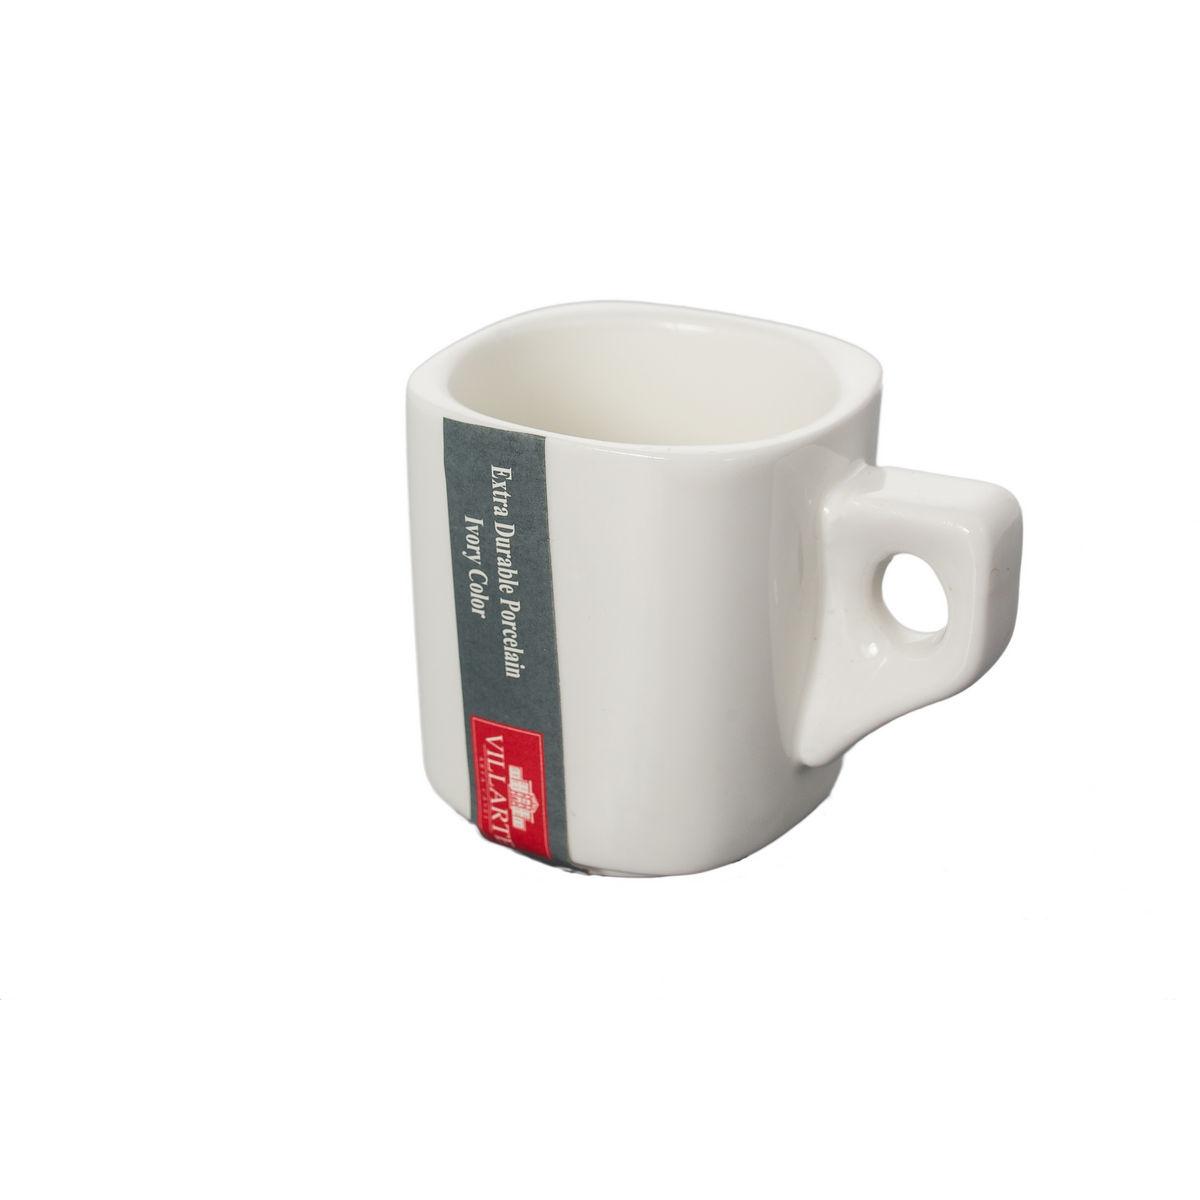 Aosta Ceasca Portelan Espresso 90 Ml 2021 aranjareamesei.ro